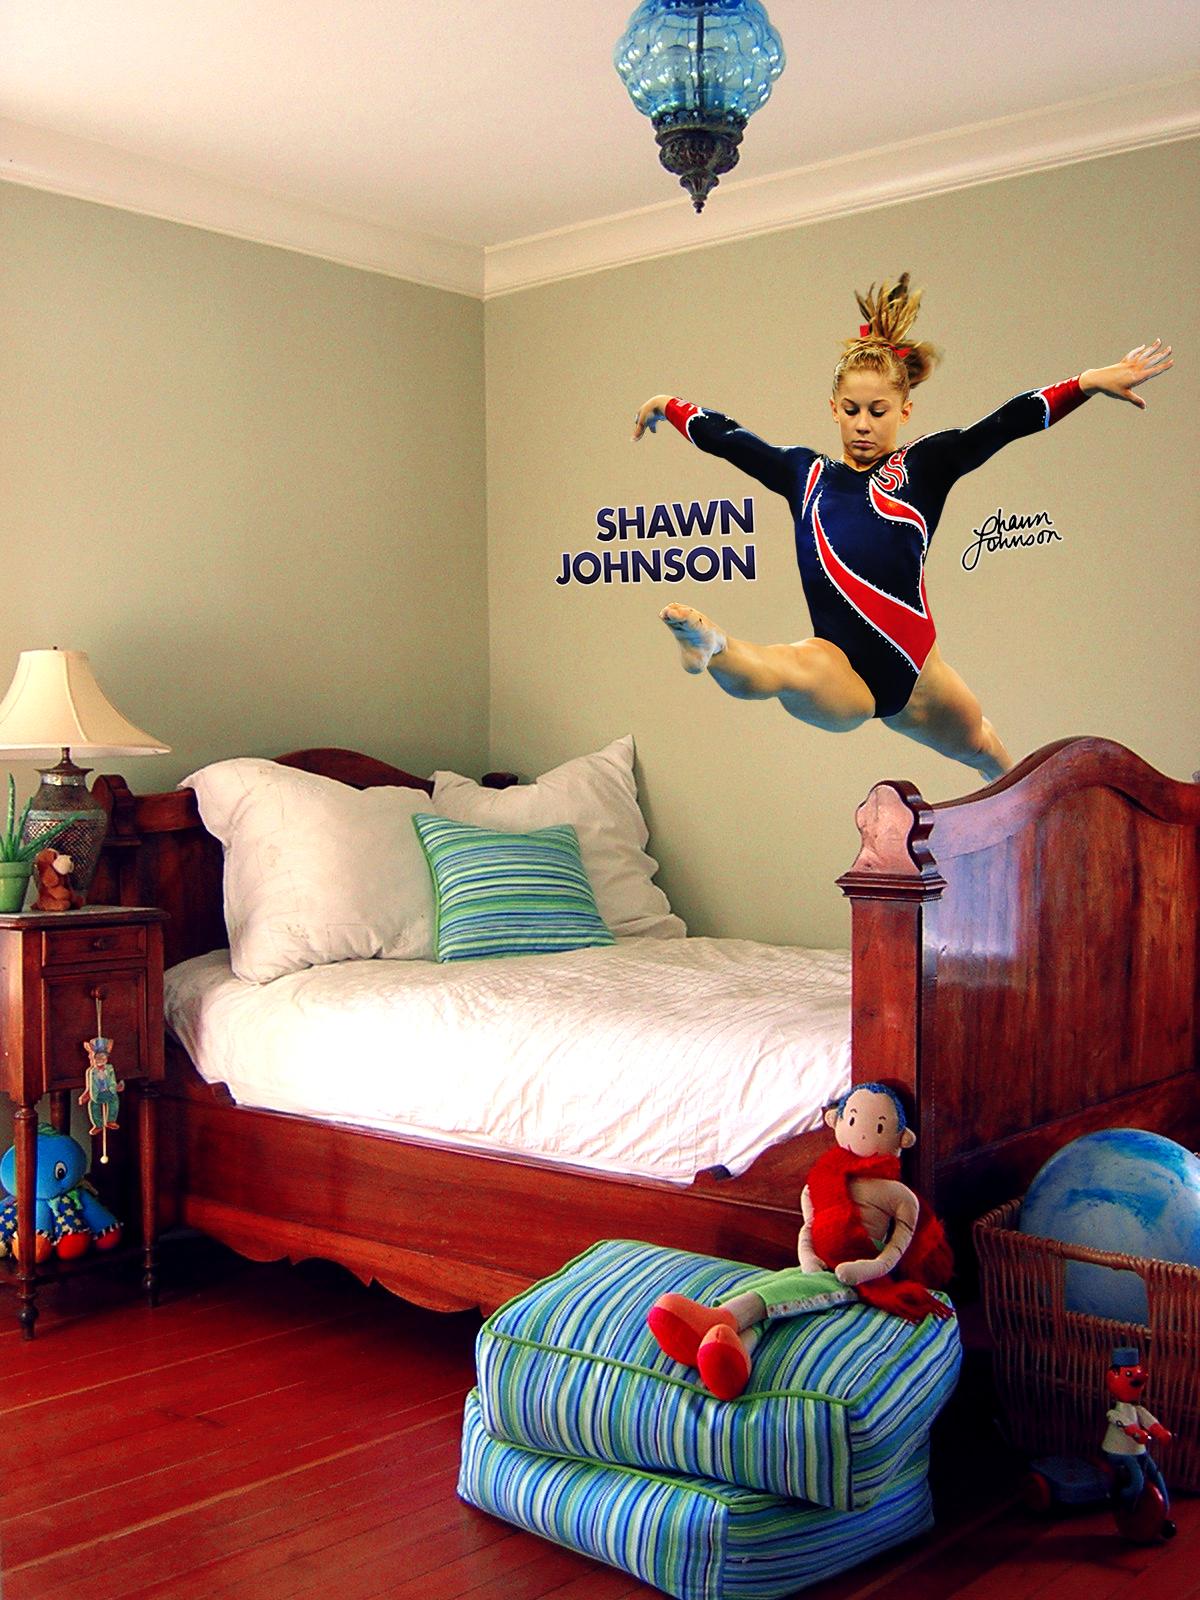 Item #209357 – Shawn Johnson Real Big WallStar : WallStars – wall ...